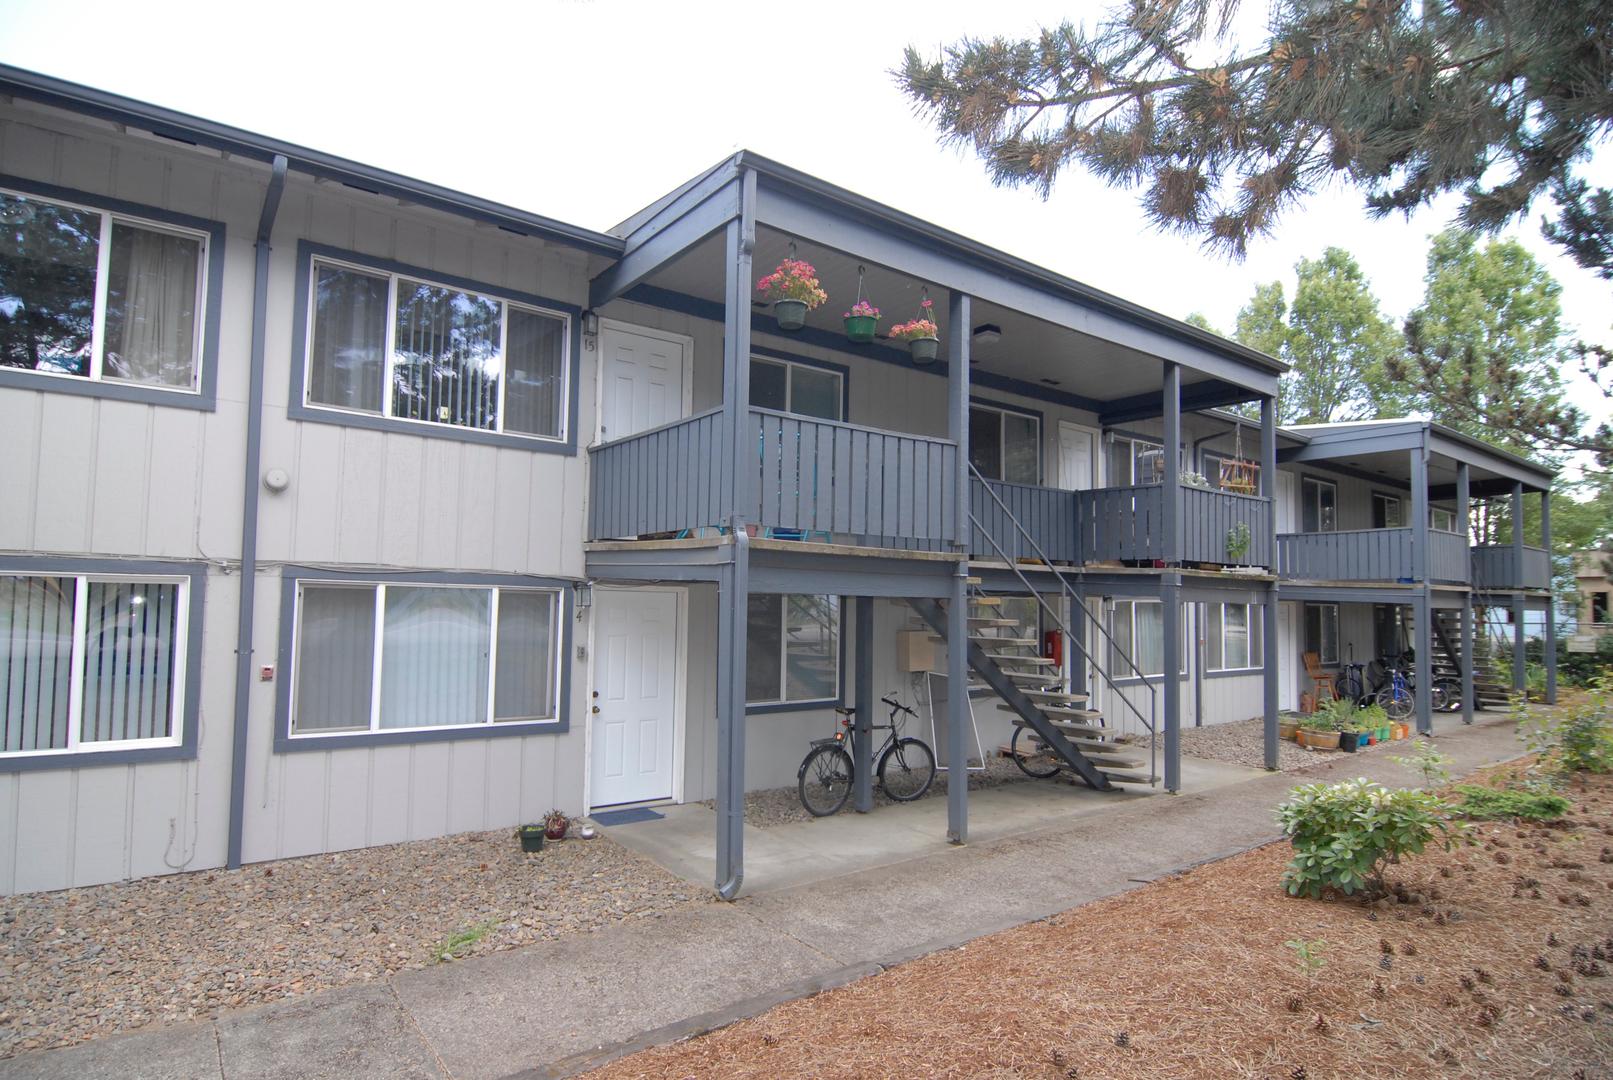 Apartment for Rent in Corvallis